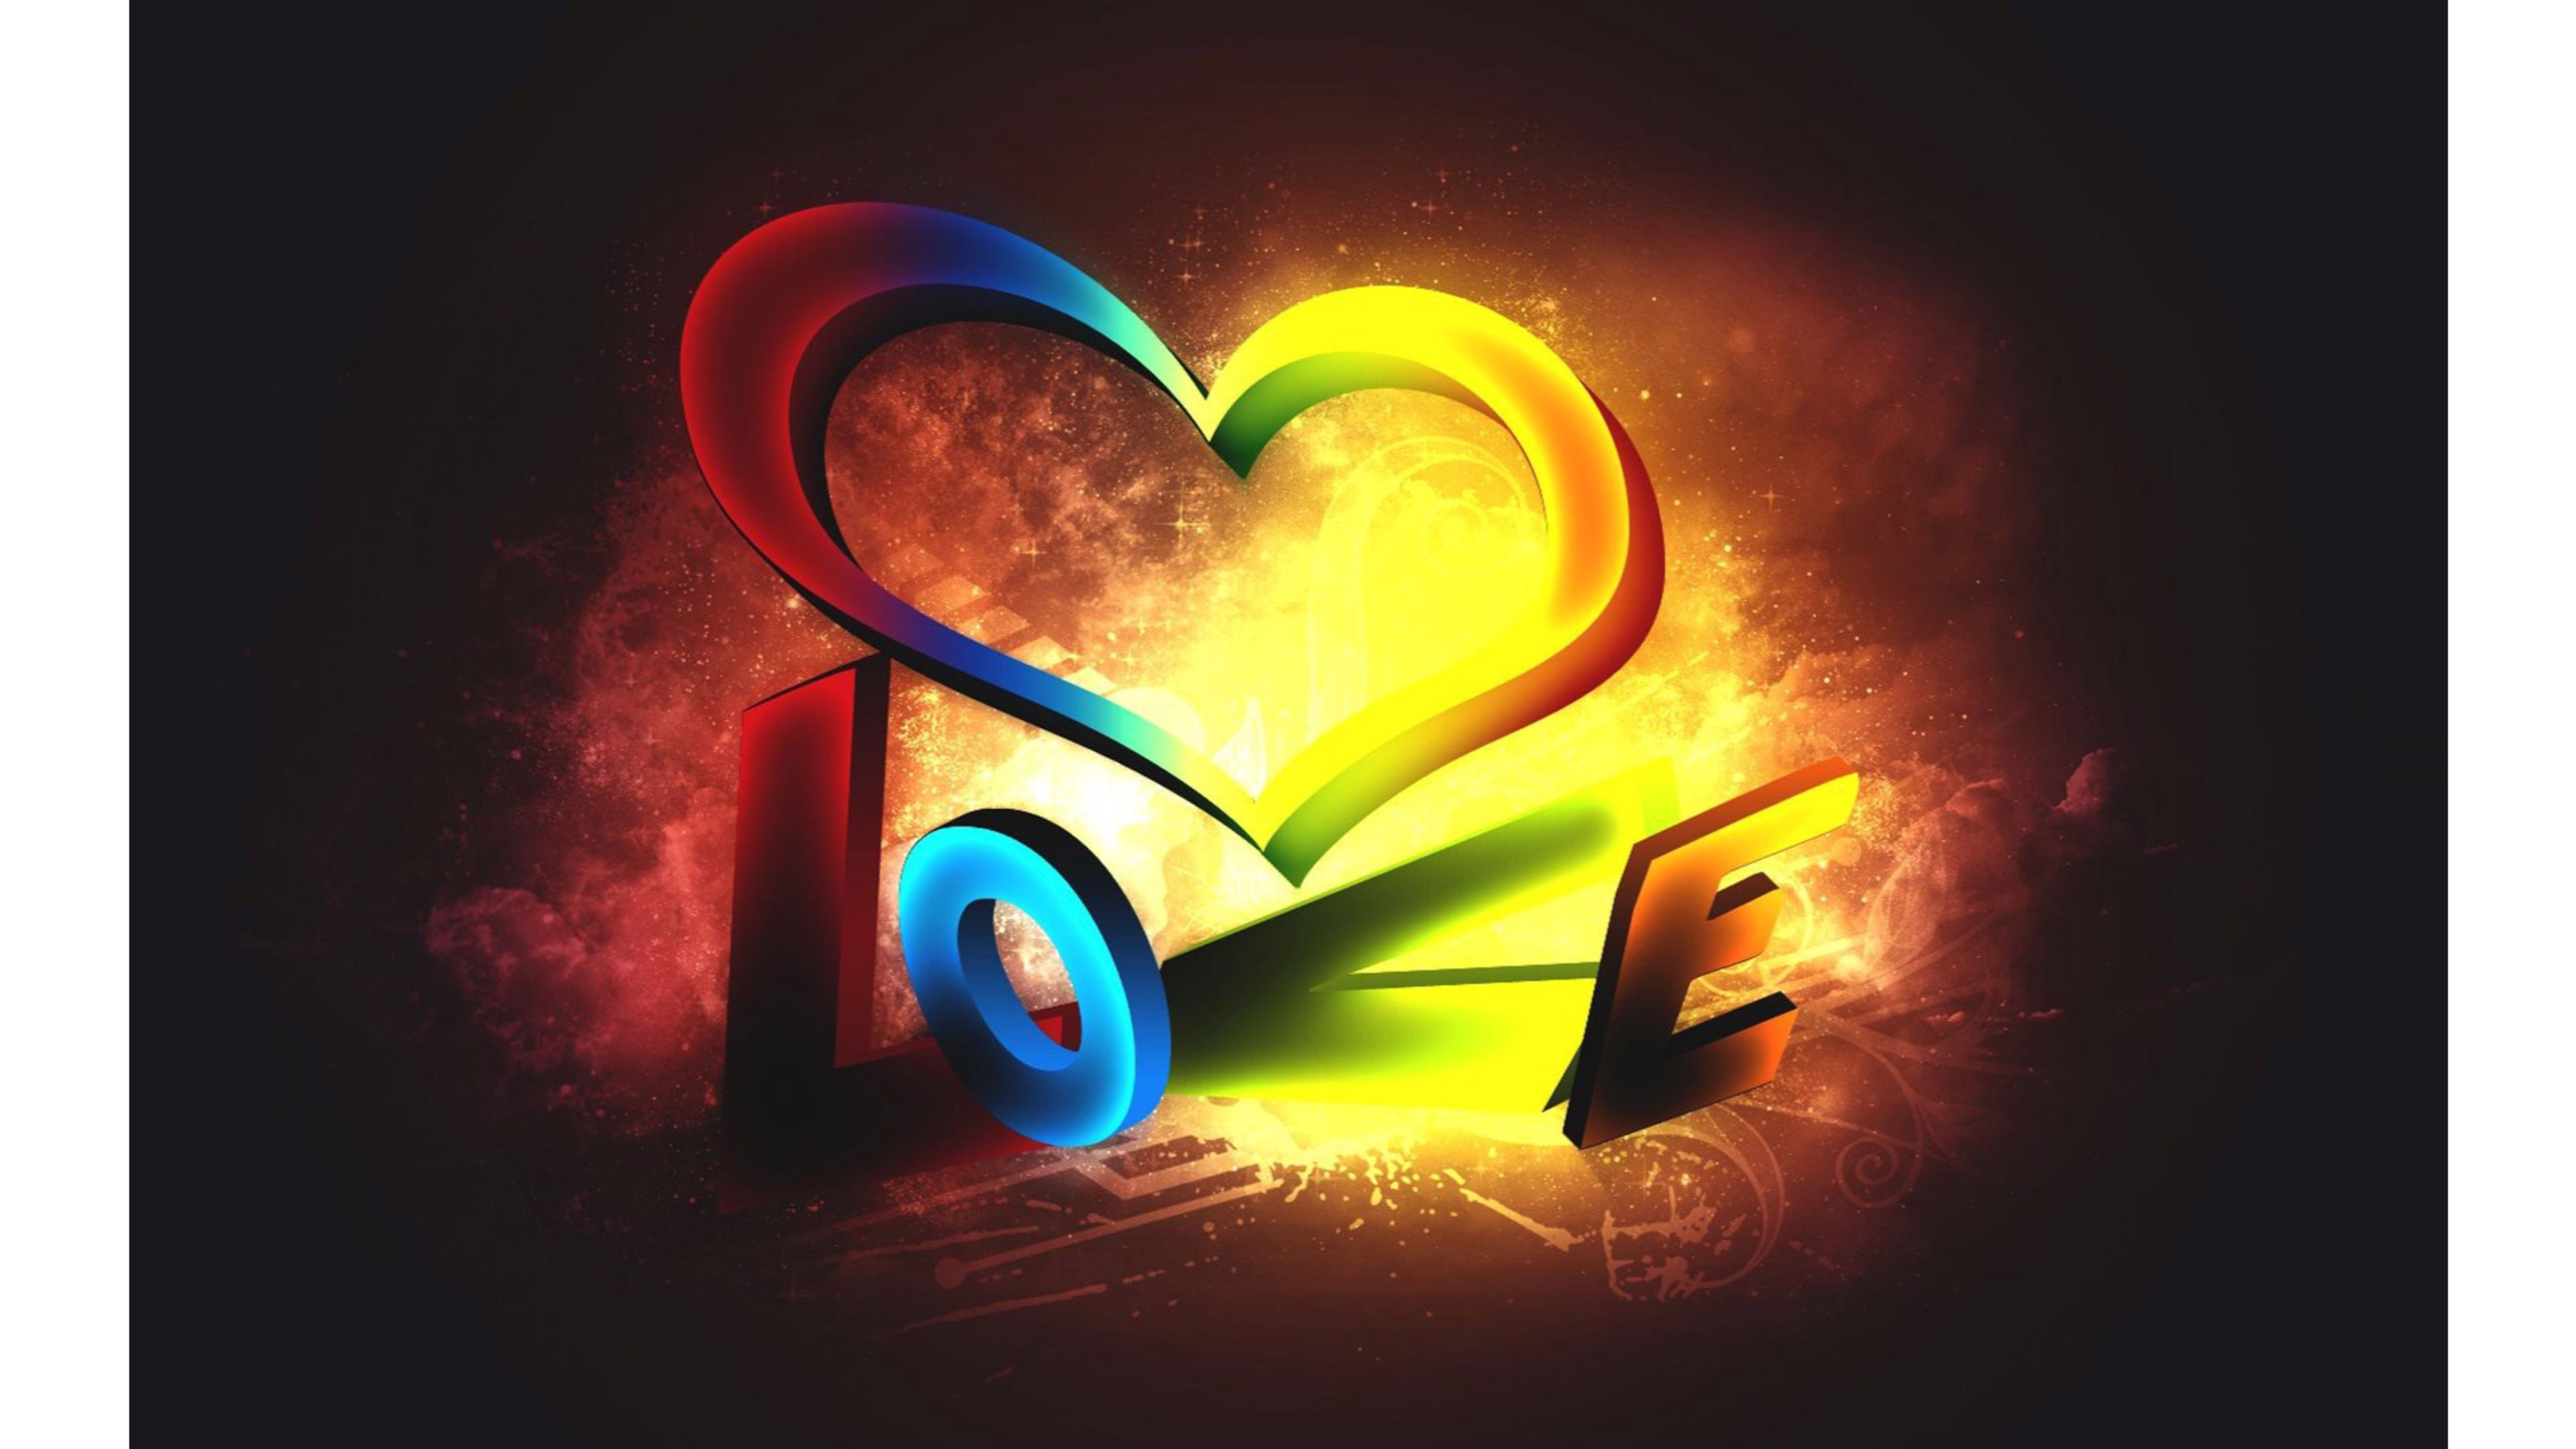 Rainbow Heart 4k Love Wallpaper Love Hd Wallpapers Download